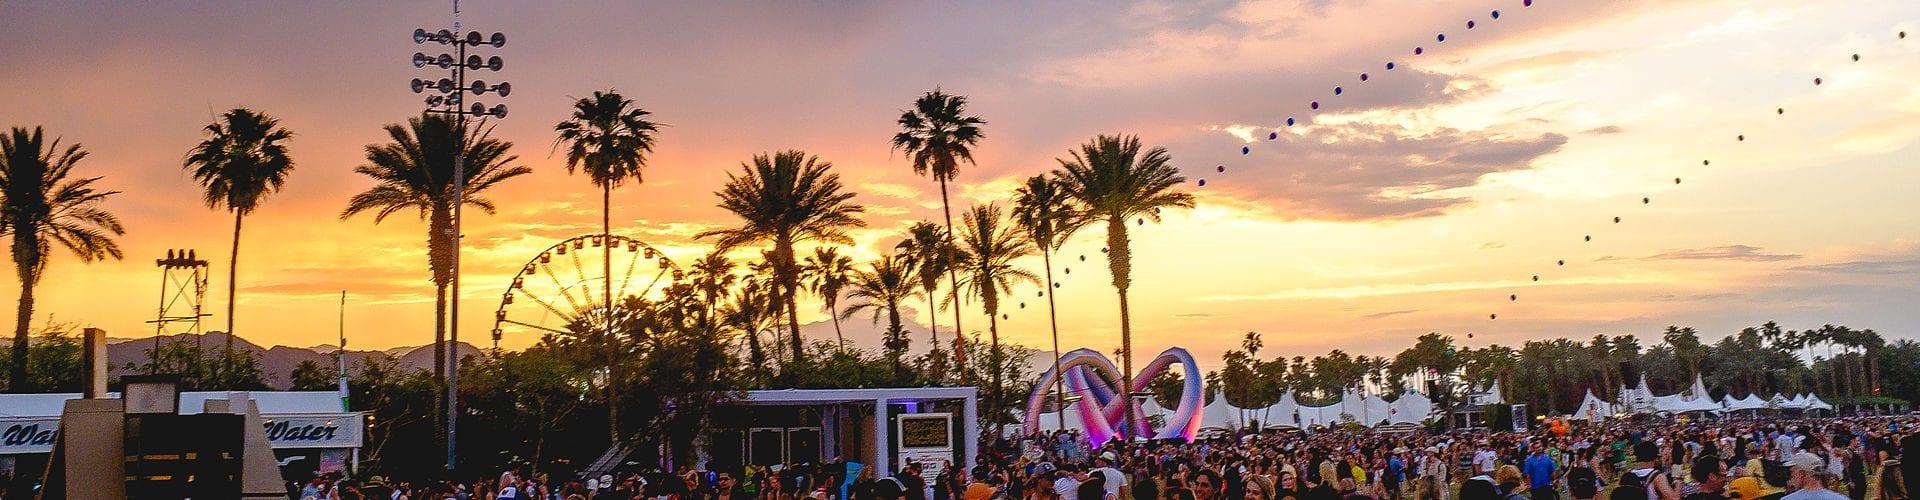 Soul'd Out Organizers Sue Coachella Alleging Anti-trust Violations